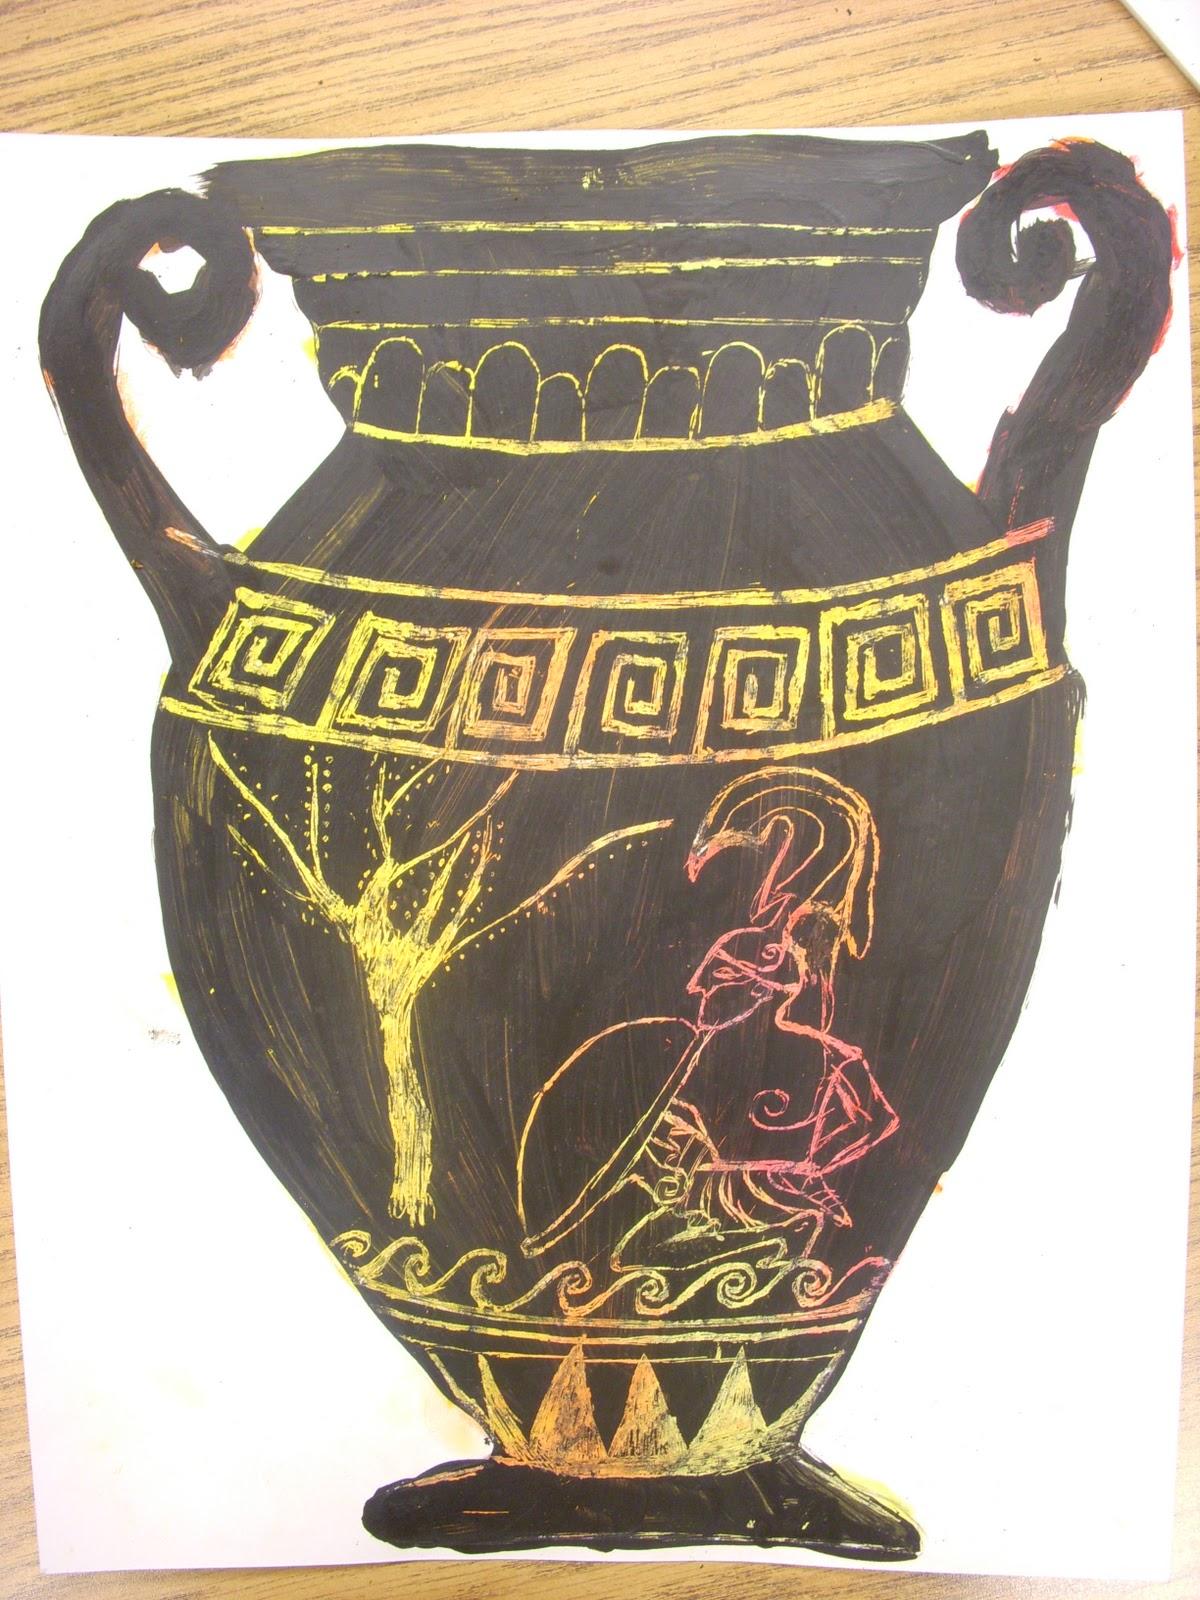 1200x1600 Artastic! Miss Oetken's Artists Going Greek! Scratch Into History